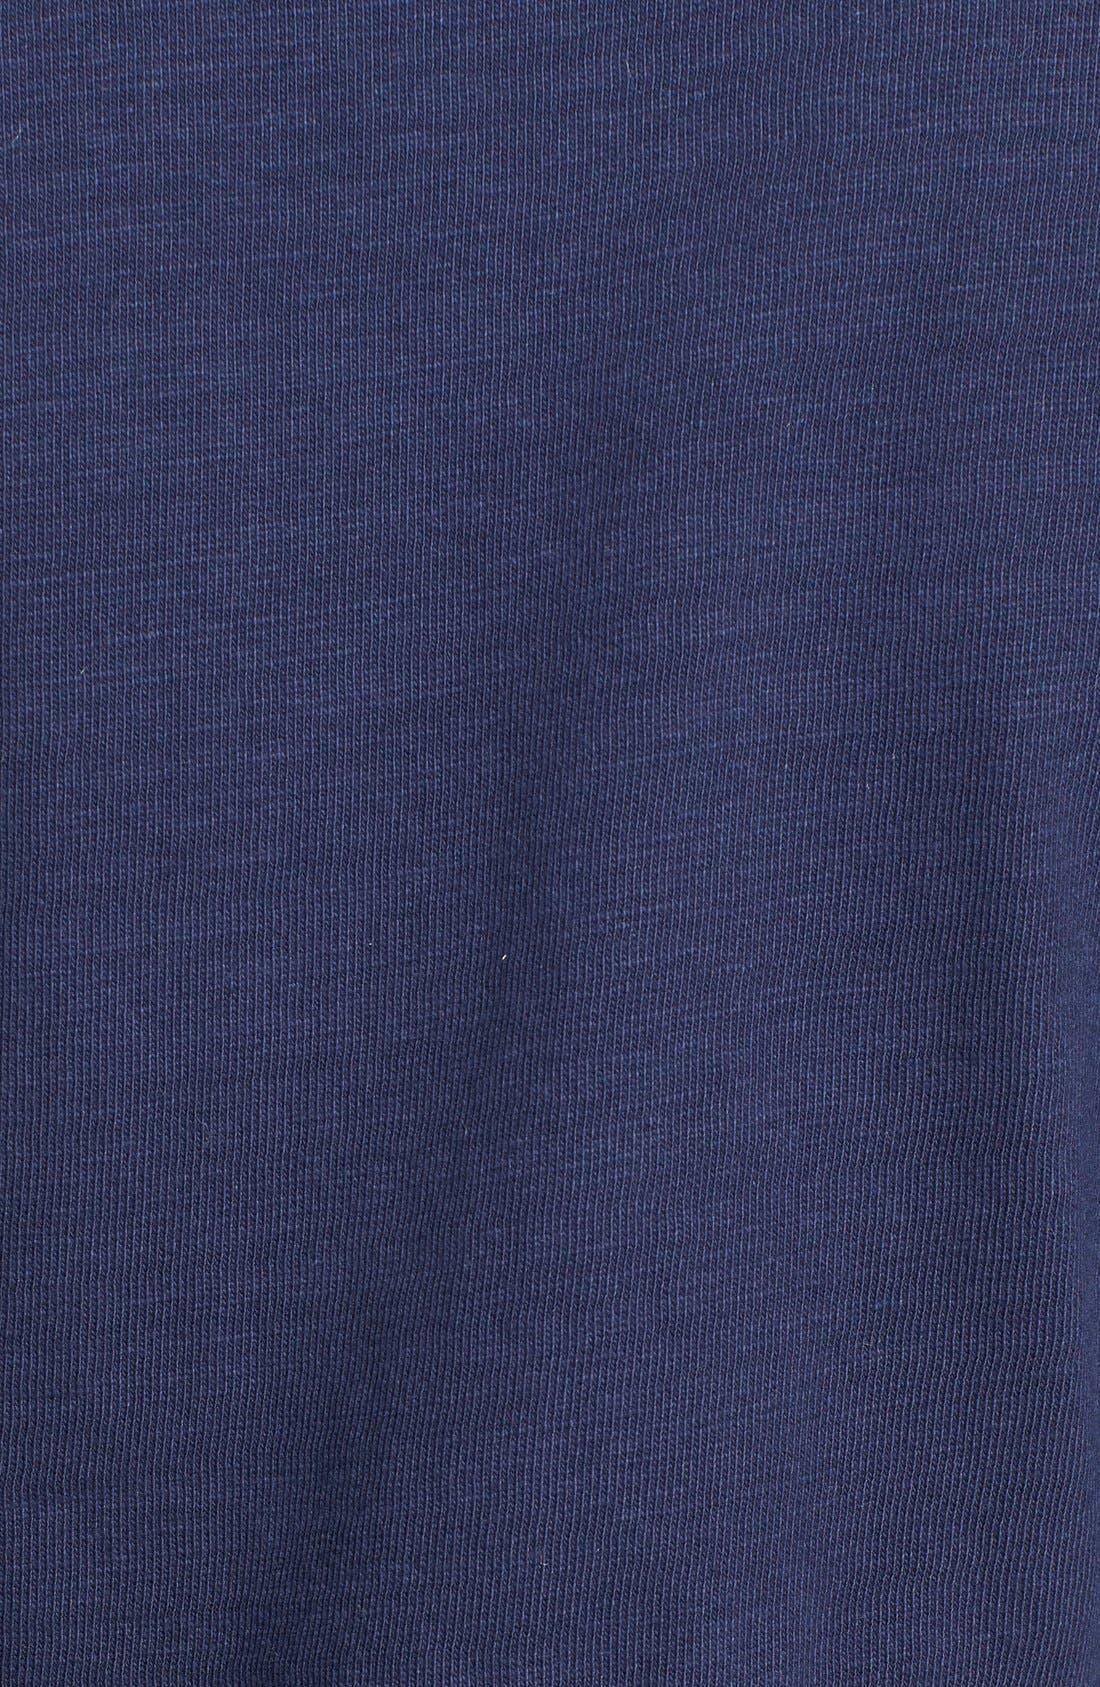 Knit One-Button Blazer,                             Alternate thumbnail 108, color,